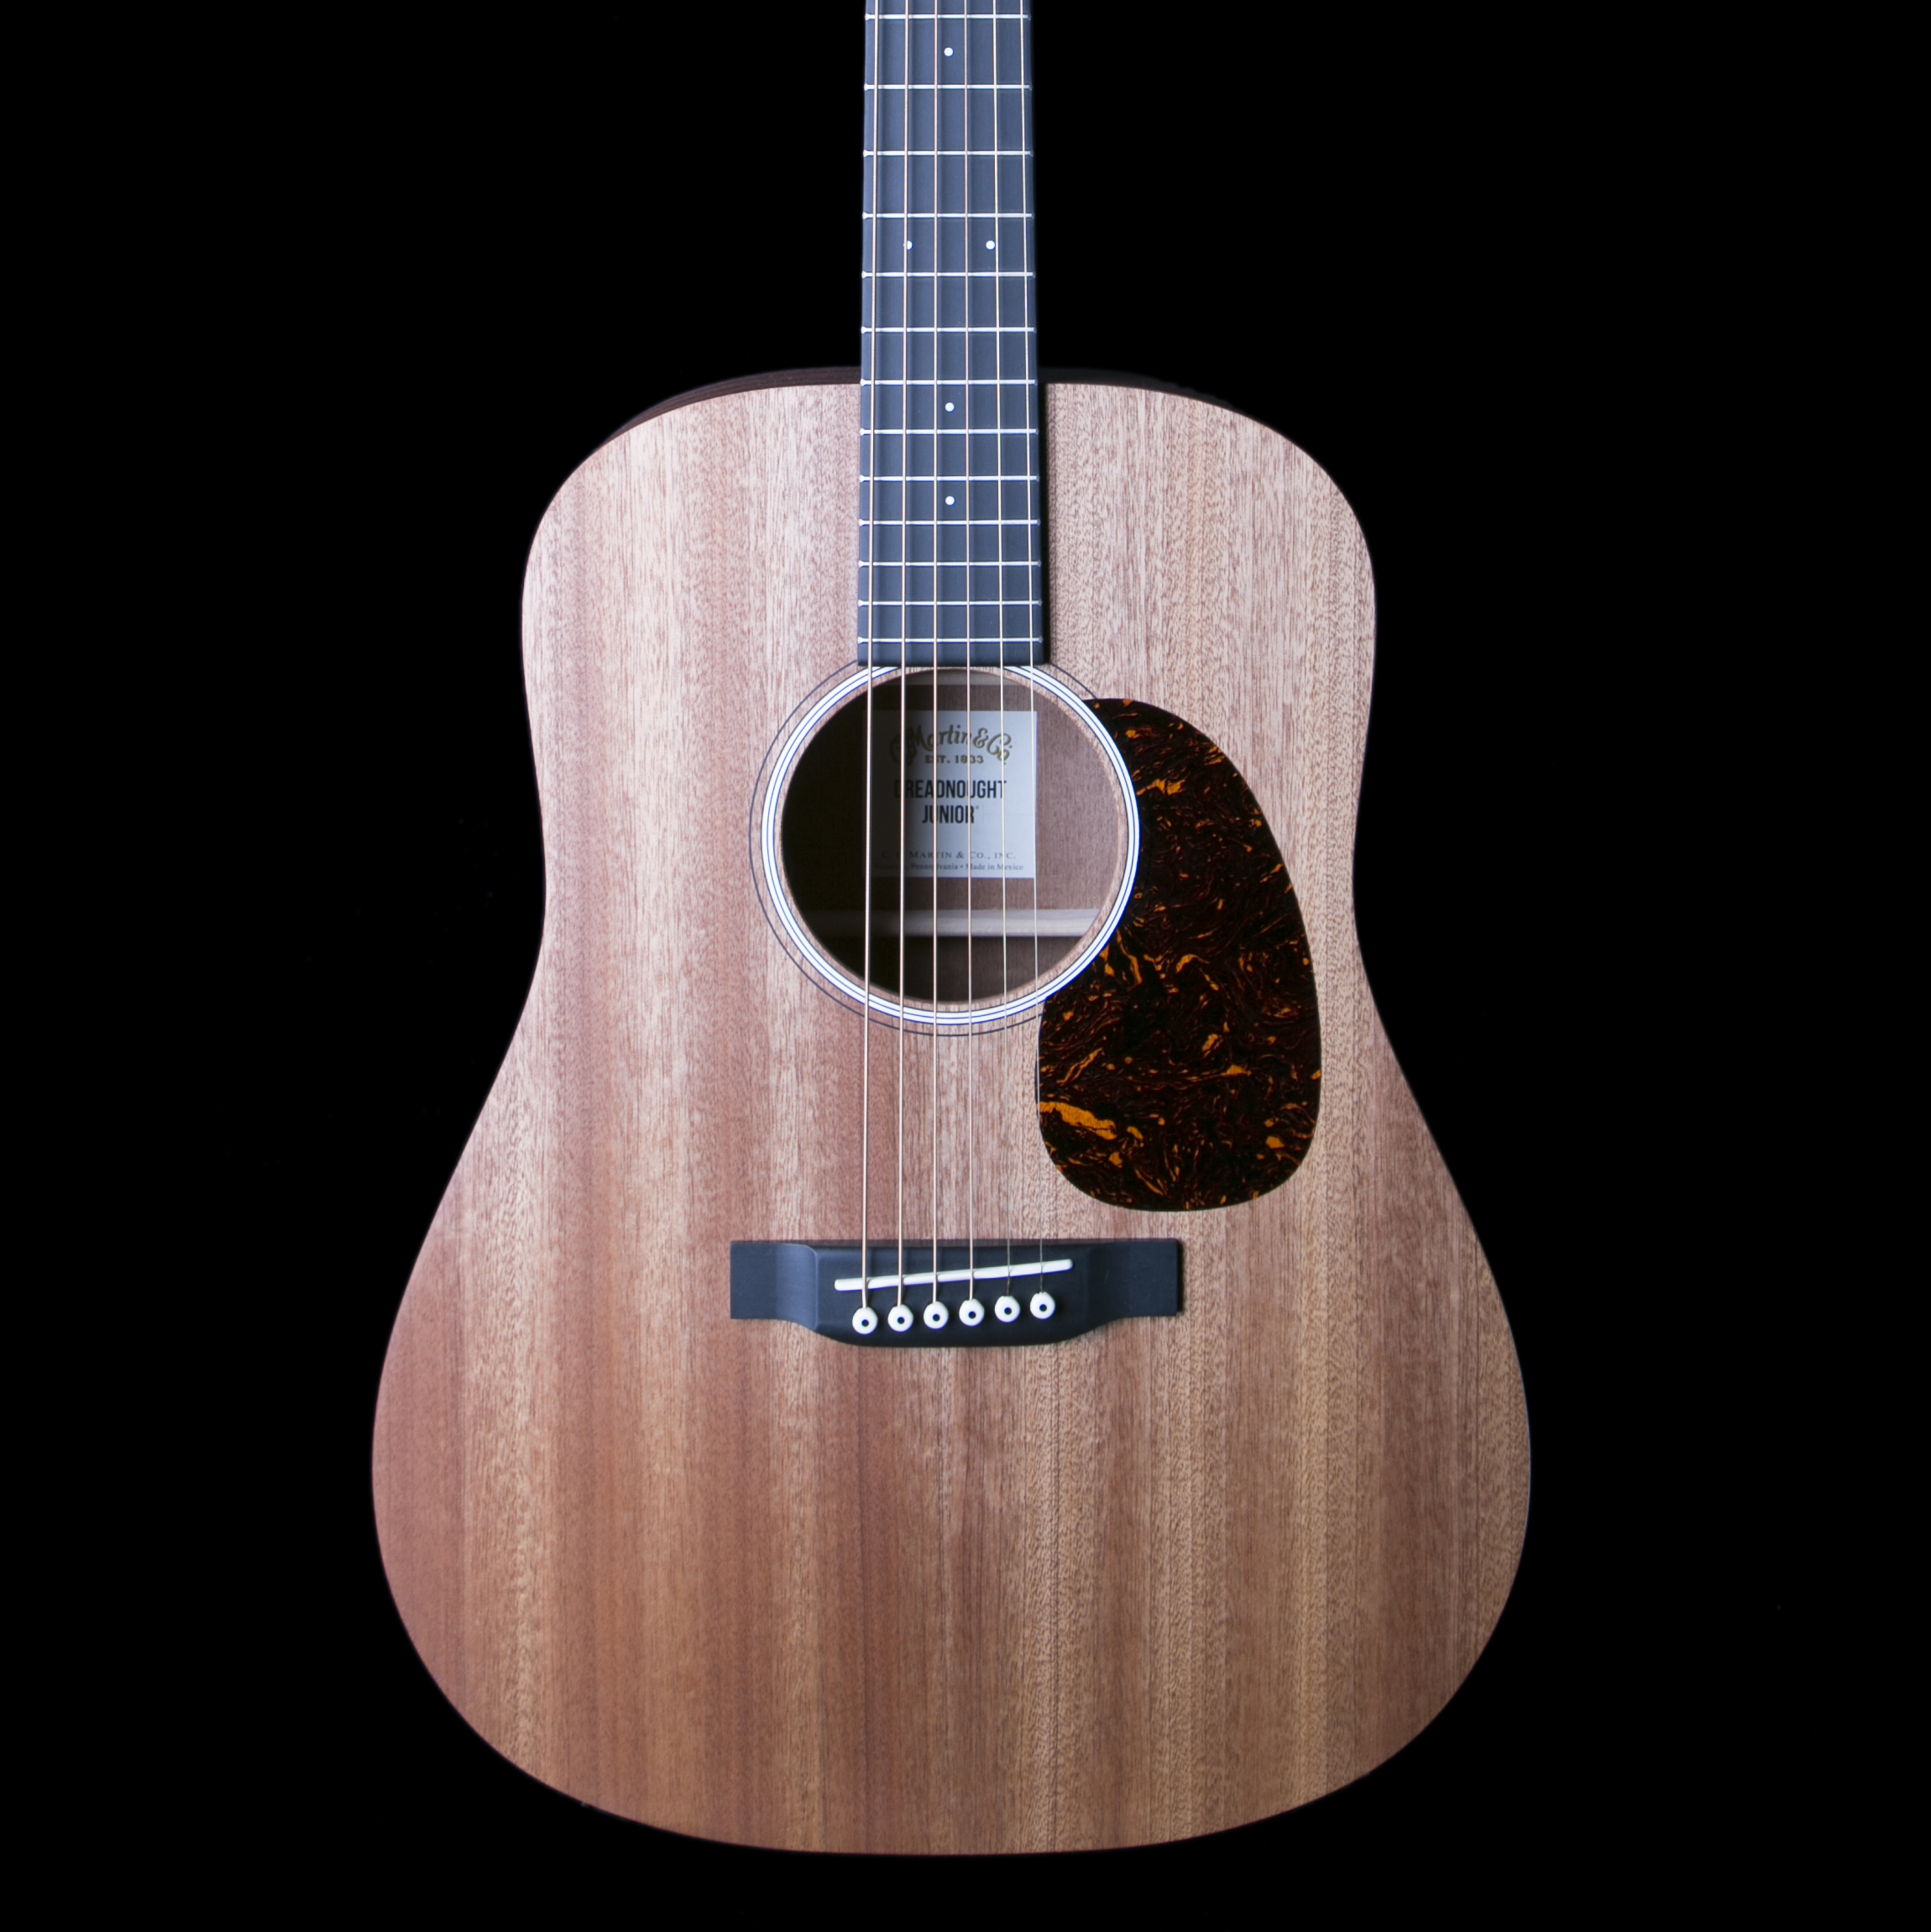 martin dreadnought junior sapele acoustic electric guitar ebay. Black Bedroom Furniture Sets. Home Design Ideas